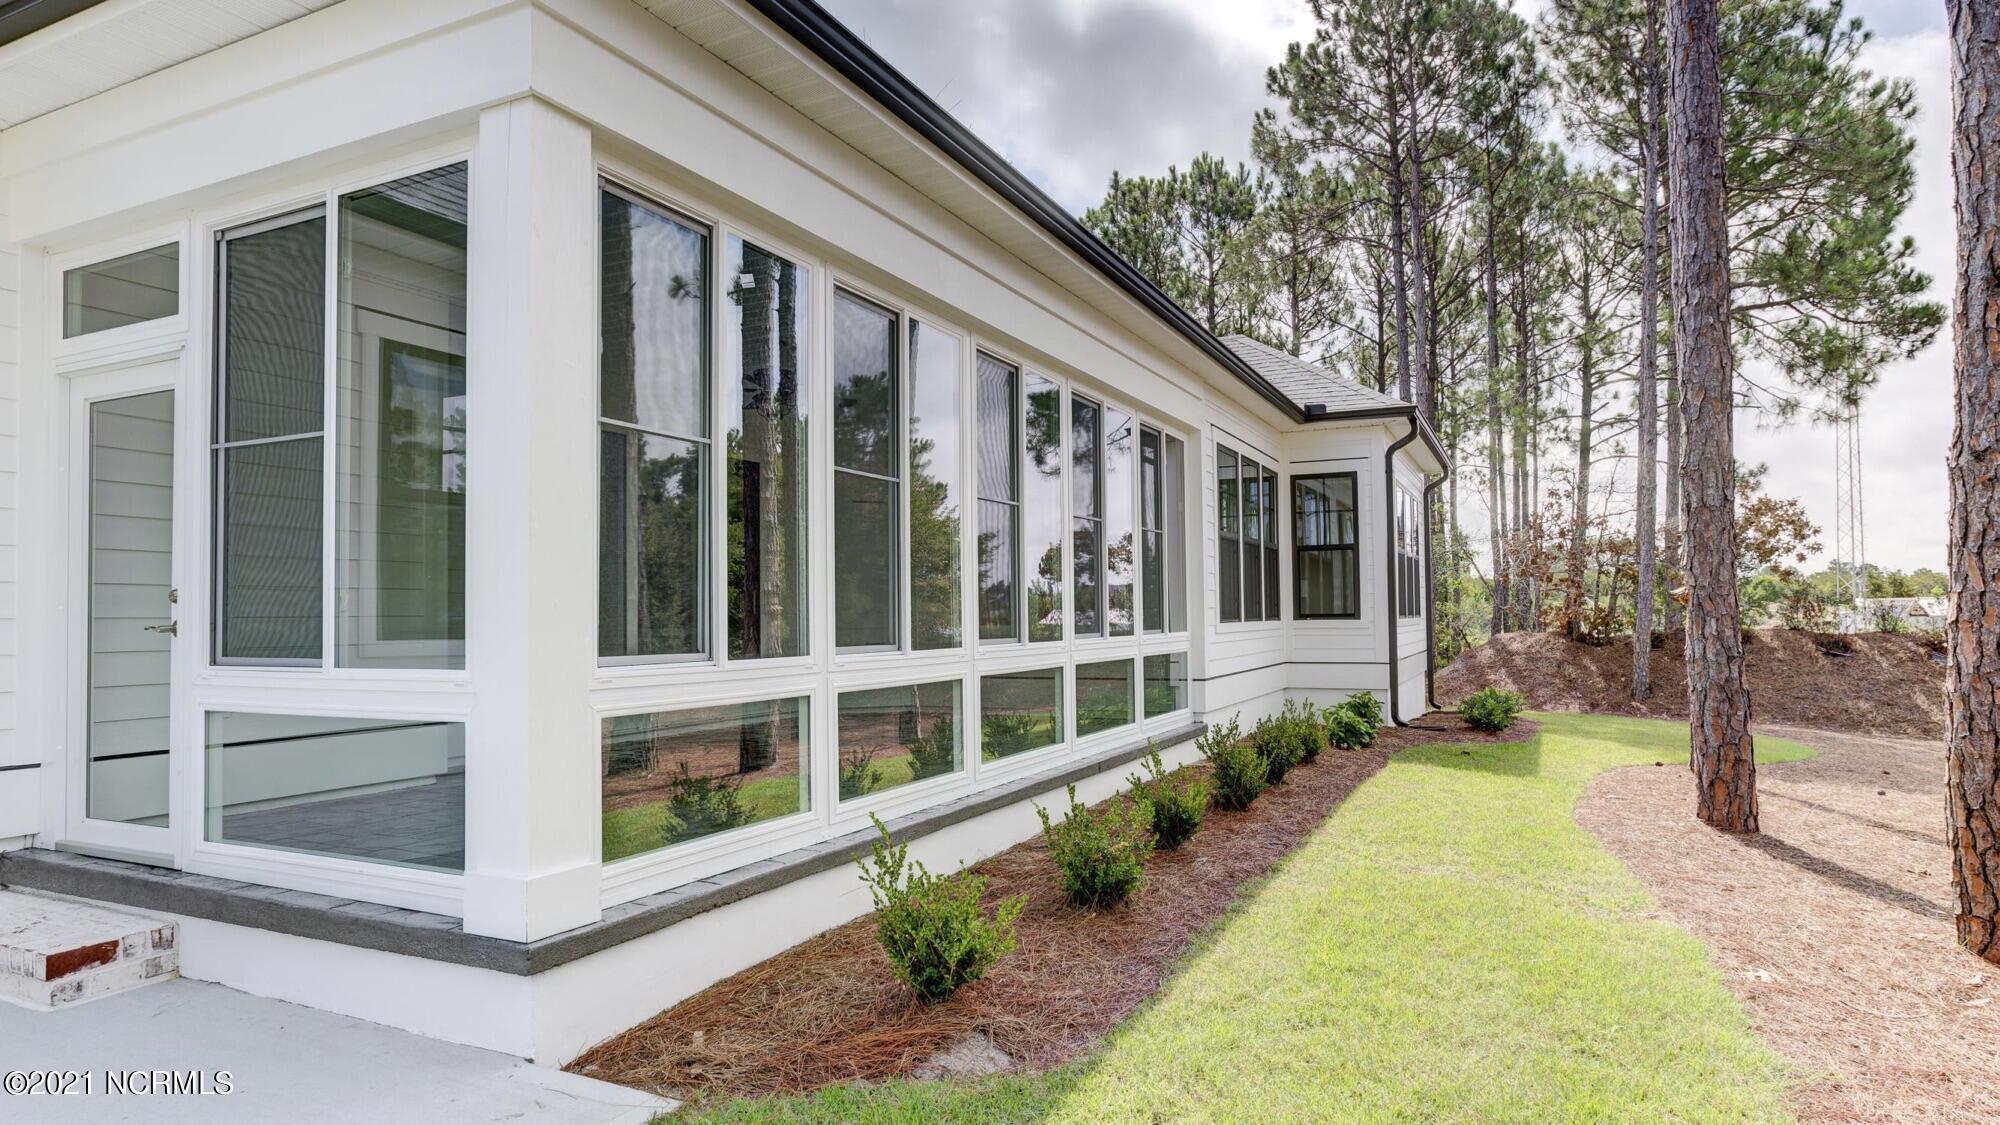 1002 Mere Court, Leland, North Carolina 28451, 4 Bedrooms Bedrooms, 11 Rooms Rooms,3 BathroomsBathrooms,Single family residence,For sale,Mere,100260633